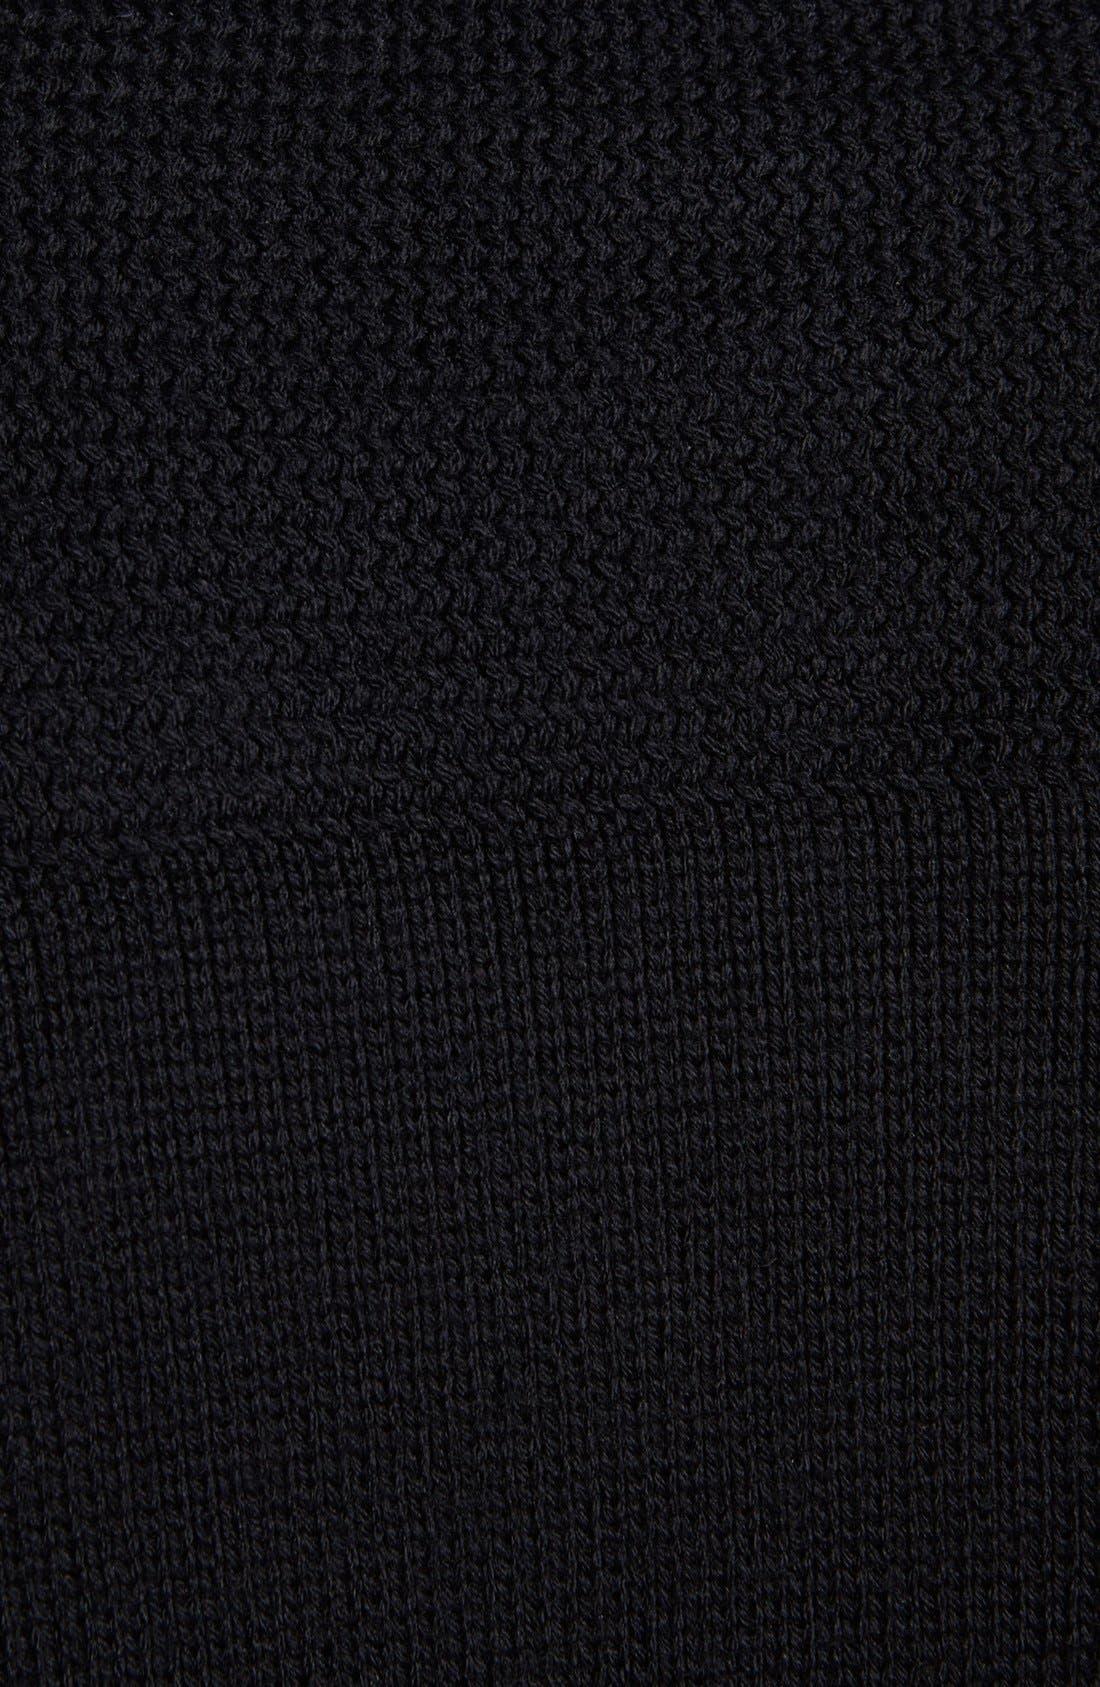 ,                             Pea Coat Sweater,                             Alternate thumbnail 2, color,                             001